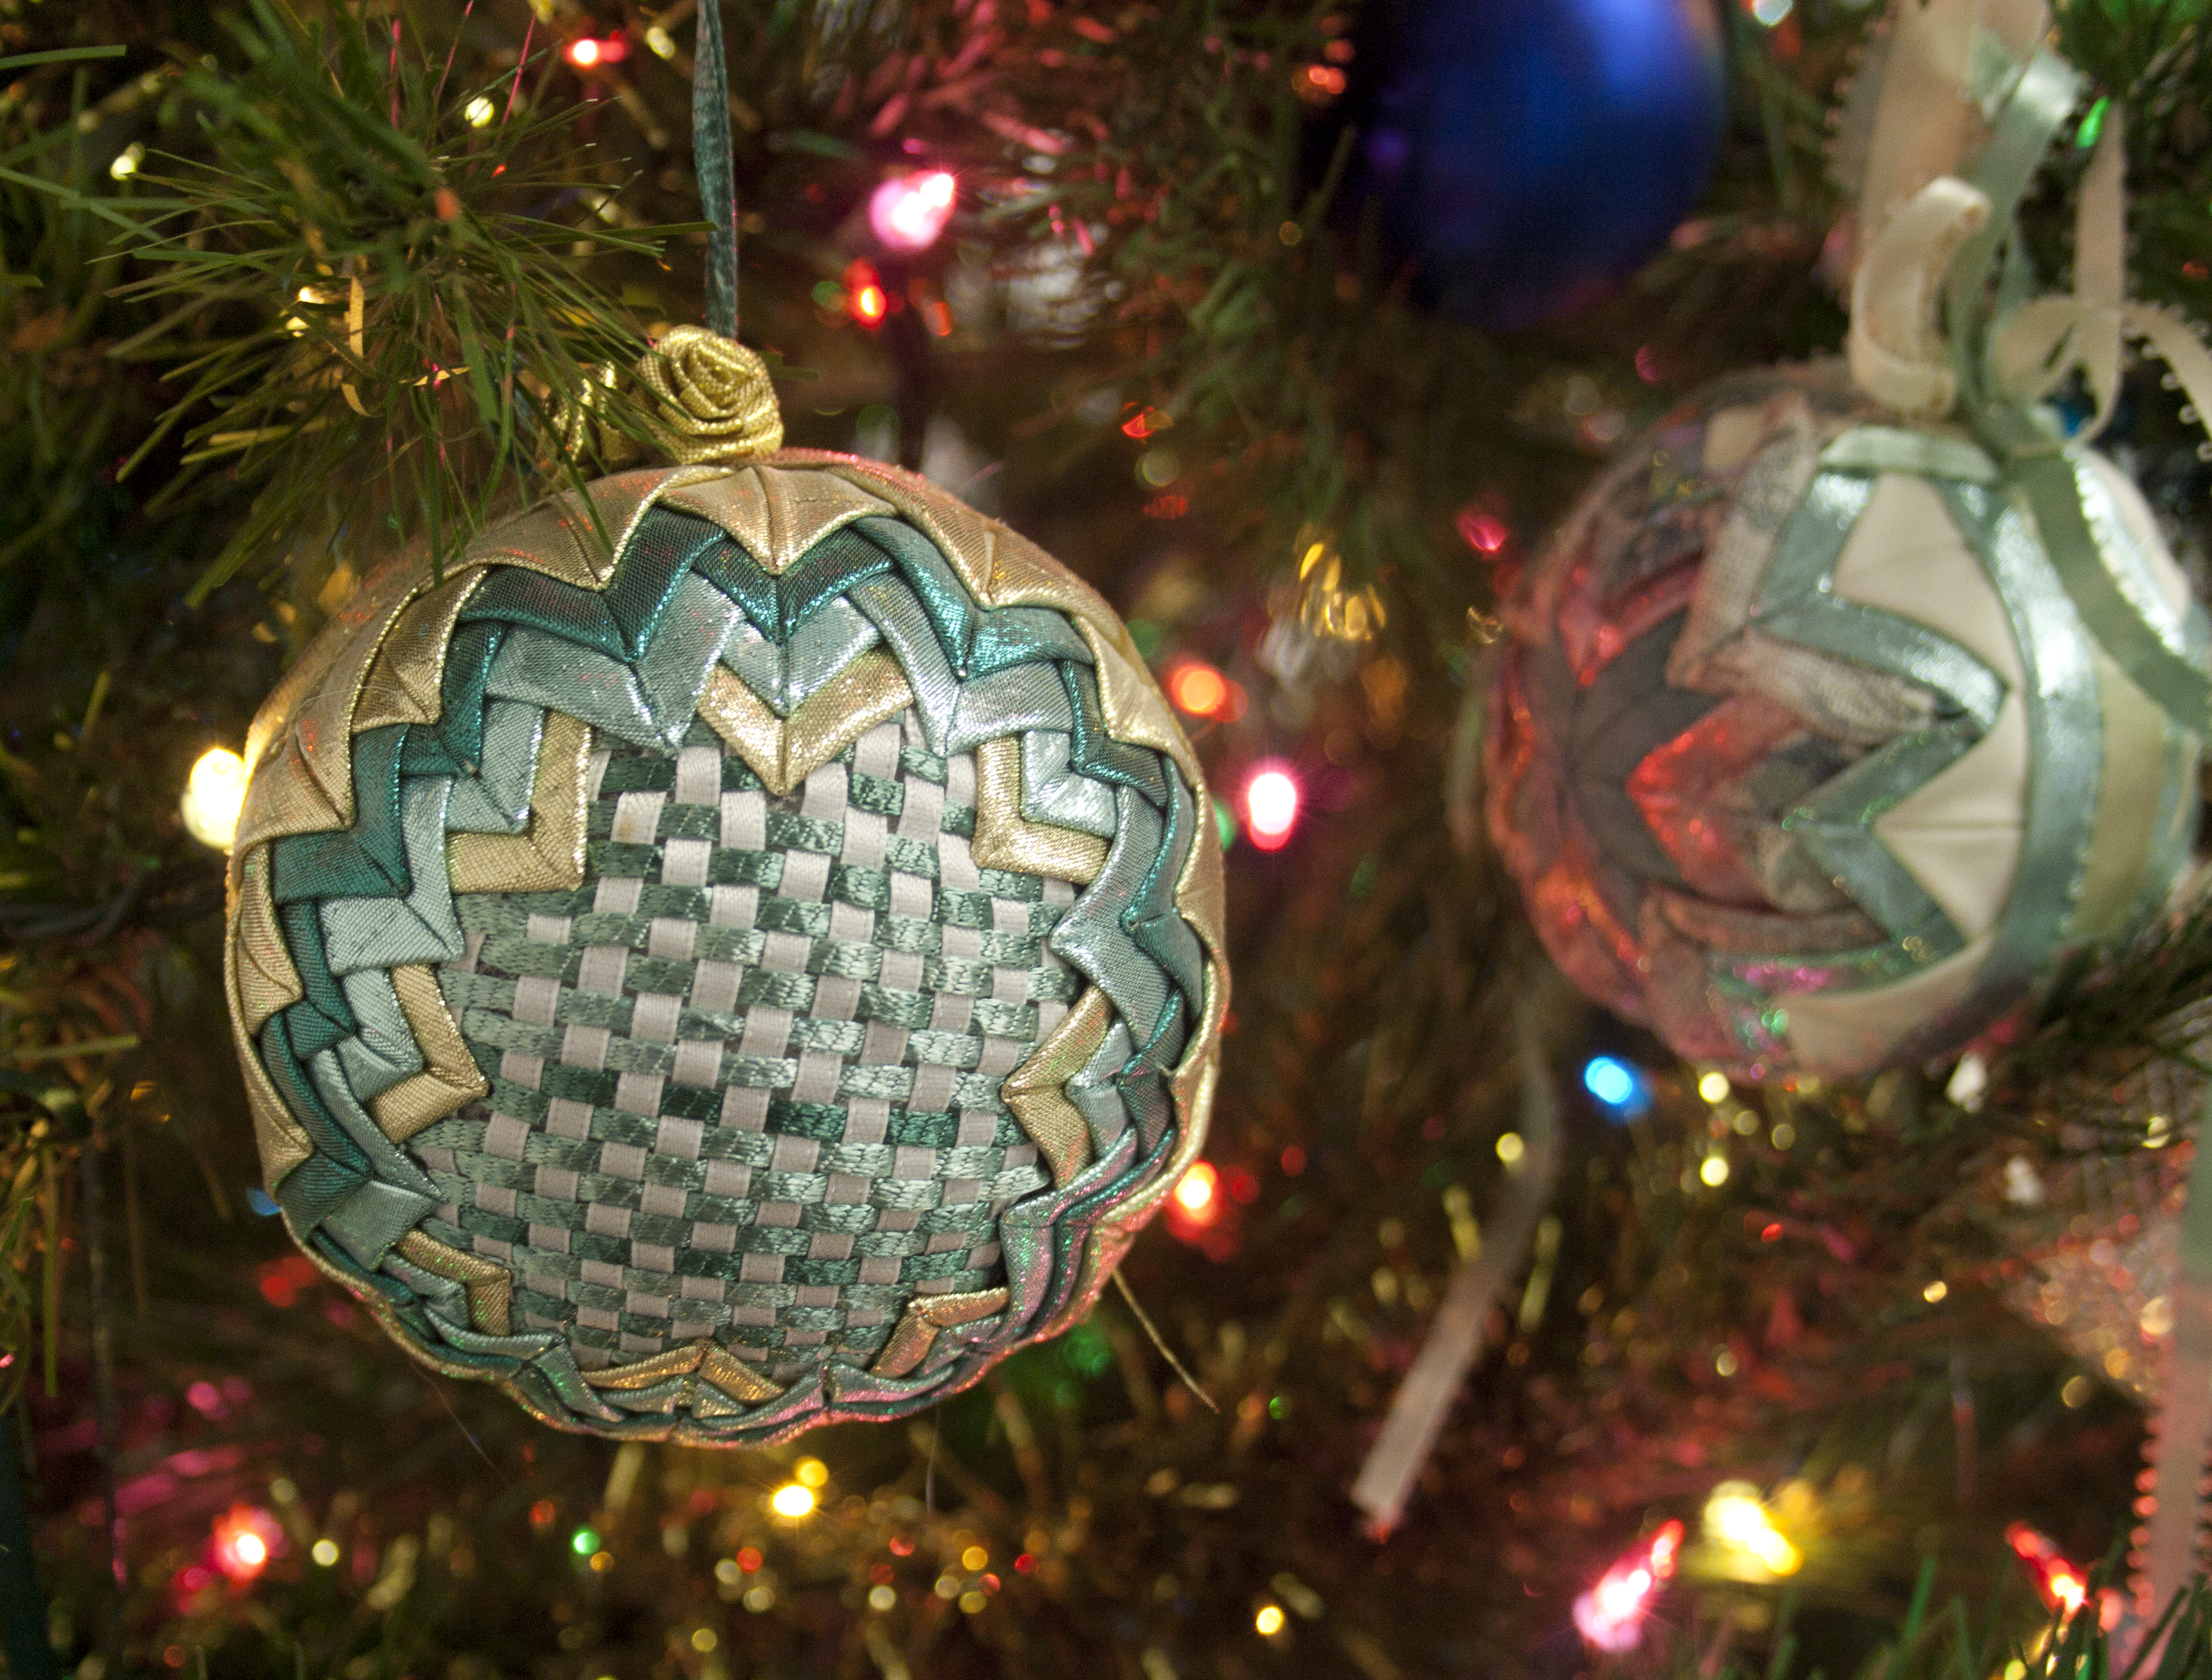 Styrofoam christmas ornaments - Dec 11 Folded Fabric Ornament